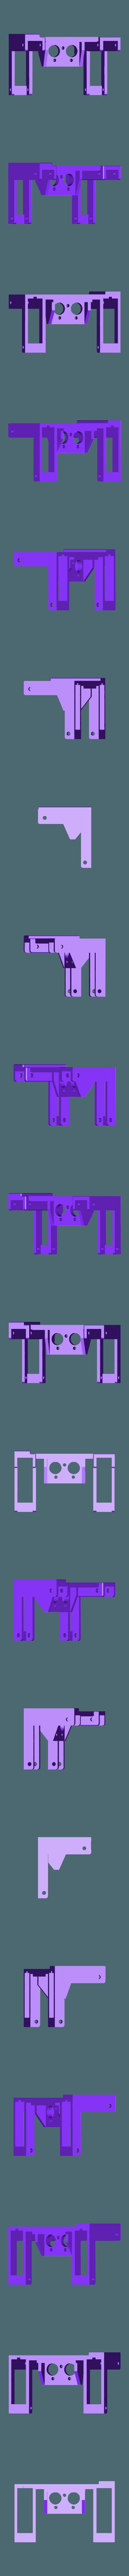 Soporte_Hotend_Chimera__Cyclops_mas_ventiladores_de_capa.stl Télécharger fichier STL gratuit Soporte Hotend Chimera & Cyclops y 2 ventiladores de capa eje X Perfil aluminio 2020 // Soporte BMG + Hotend V6 • Objet pour impression 3D, celtarra12